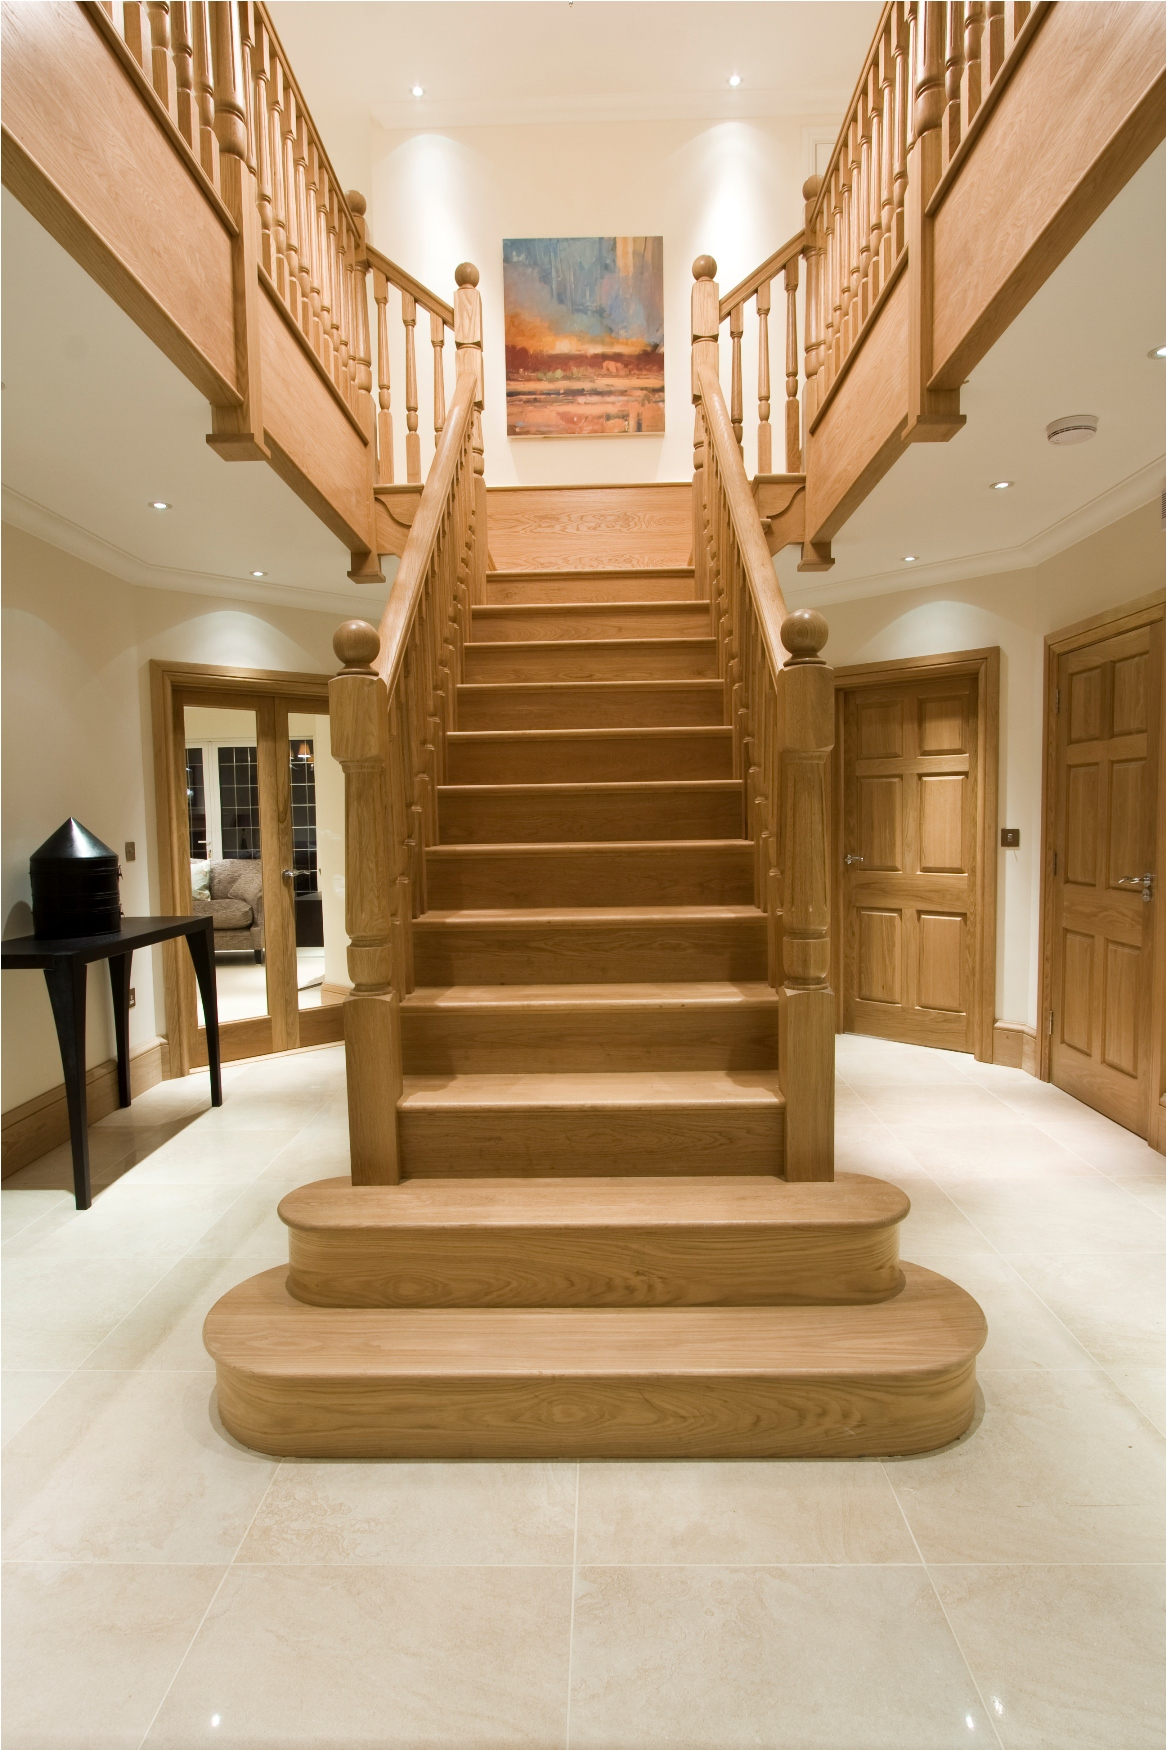 Modern Center Staircase Design 2846 House Decoration Ideas